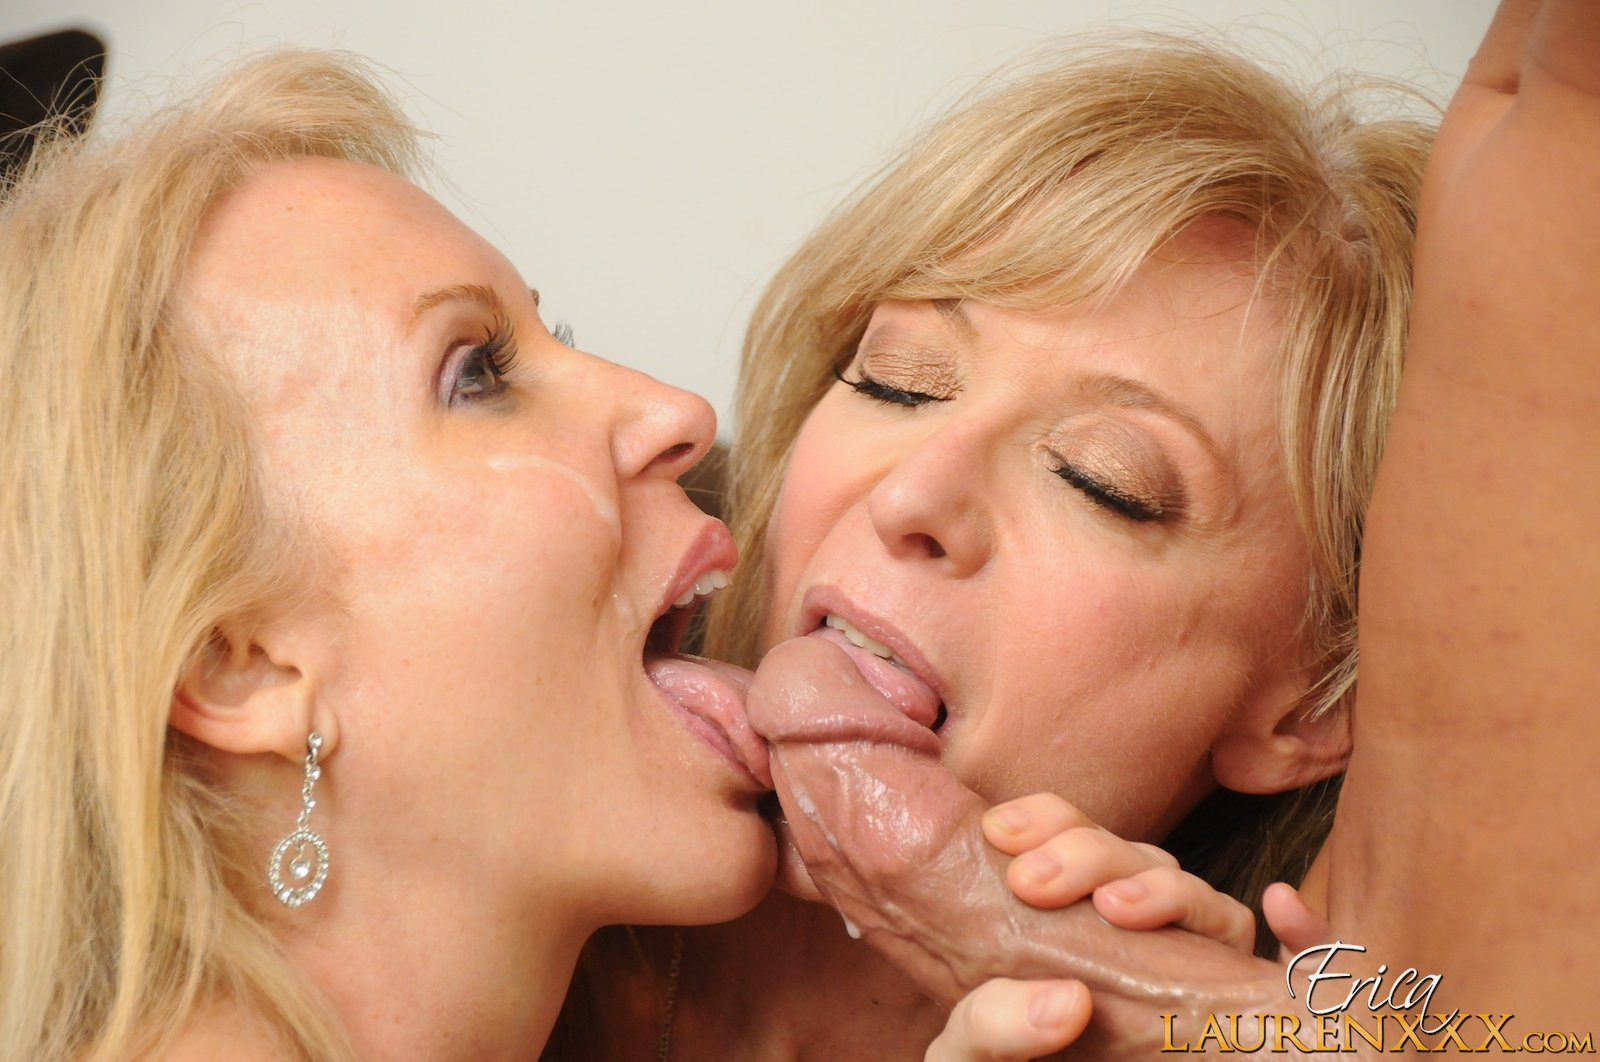 mature-ladies-threesomes-nerdy-school-gills-hot-nude